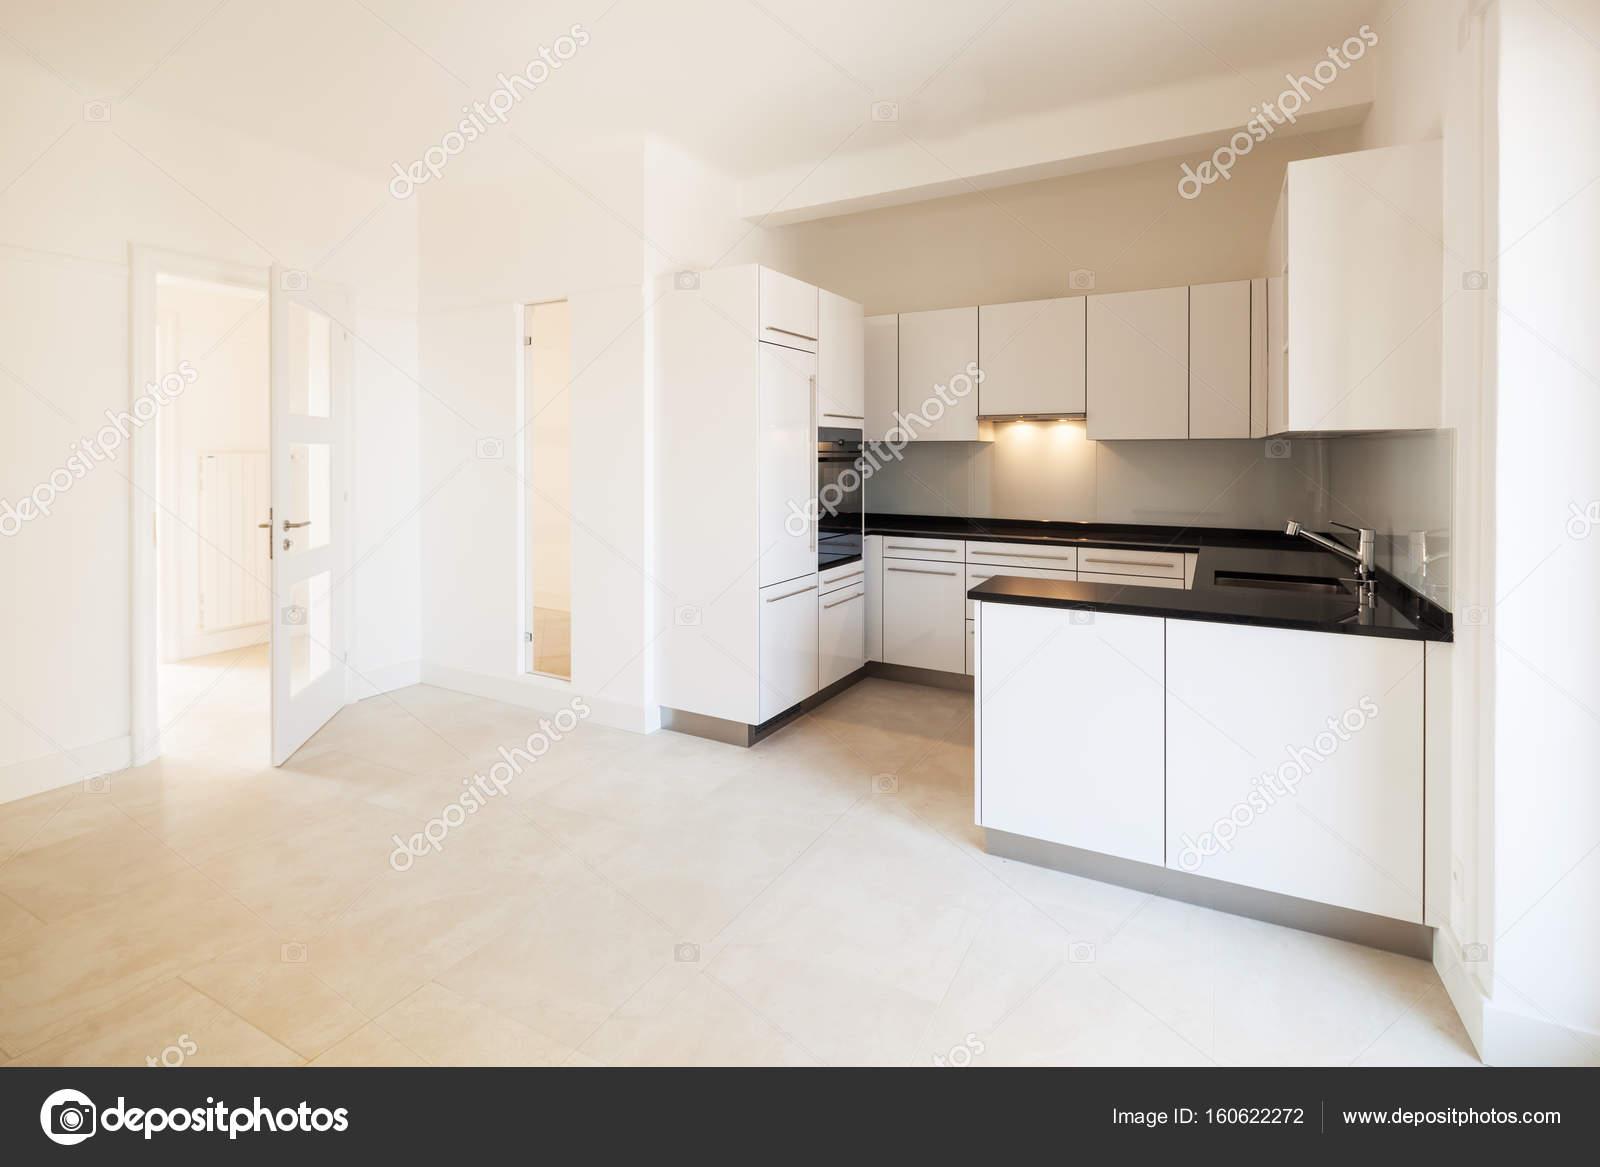 Innere Leere Küche — Stockfoto © Zveiger #160622272